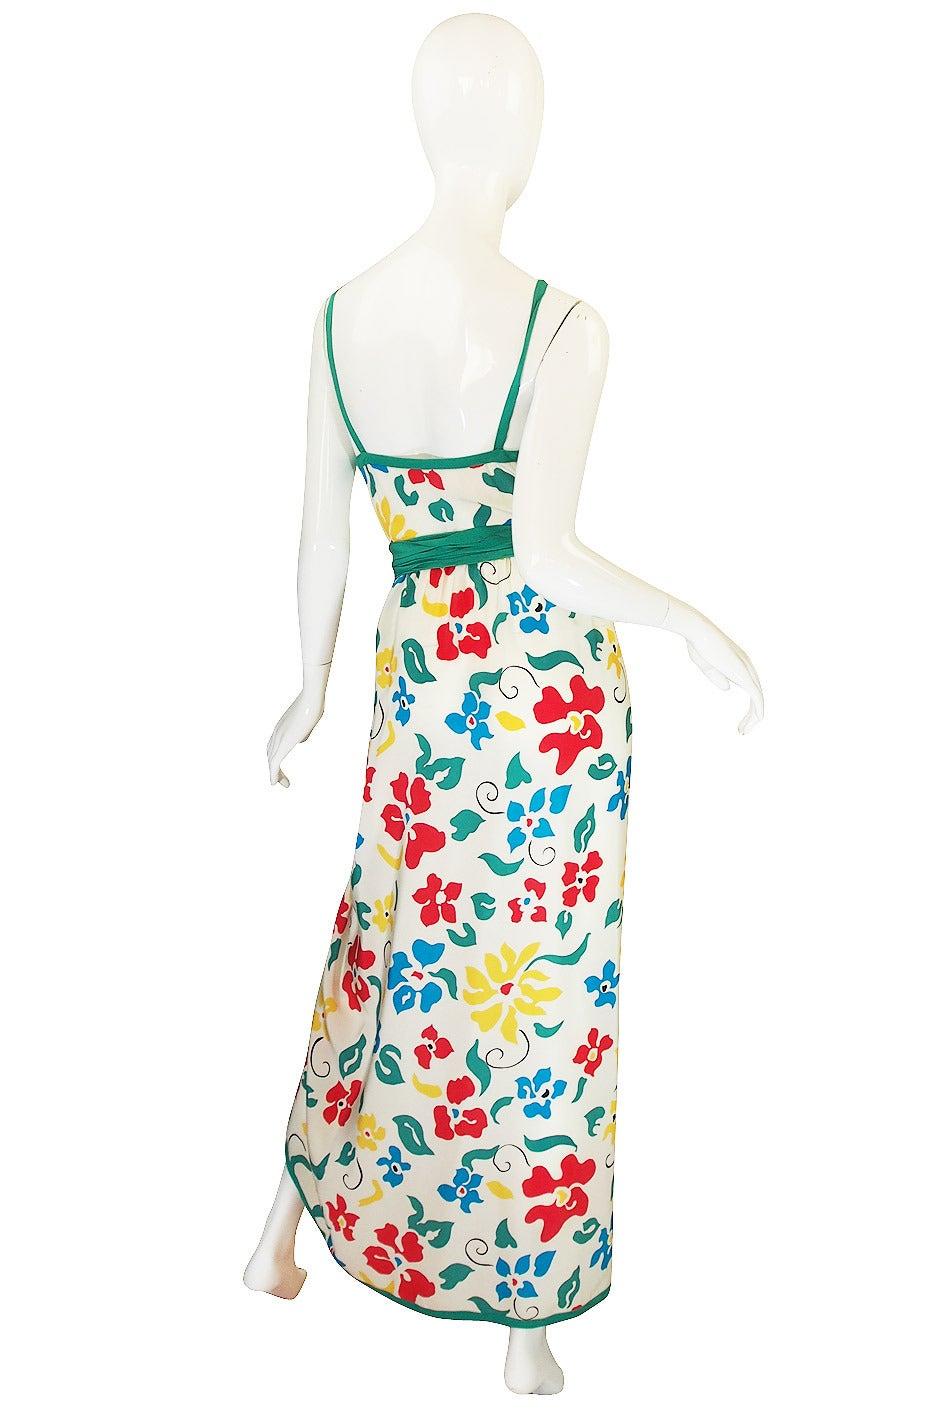 1979 Oscar De La Renta Dress as Seen in Vogue 2